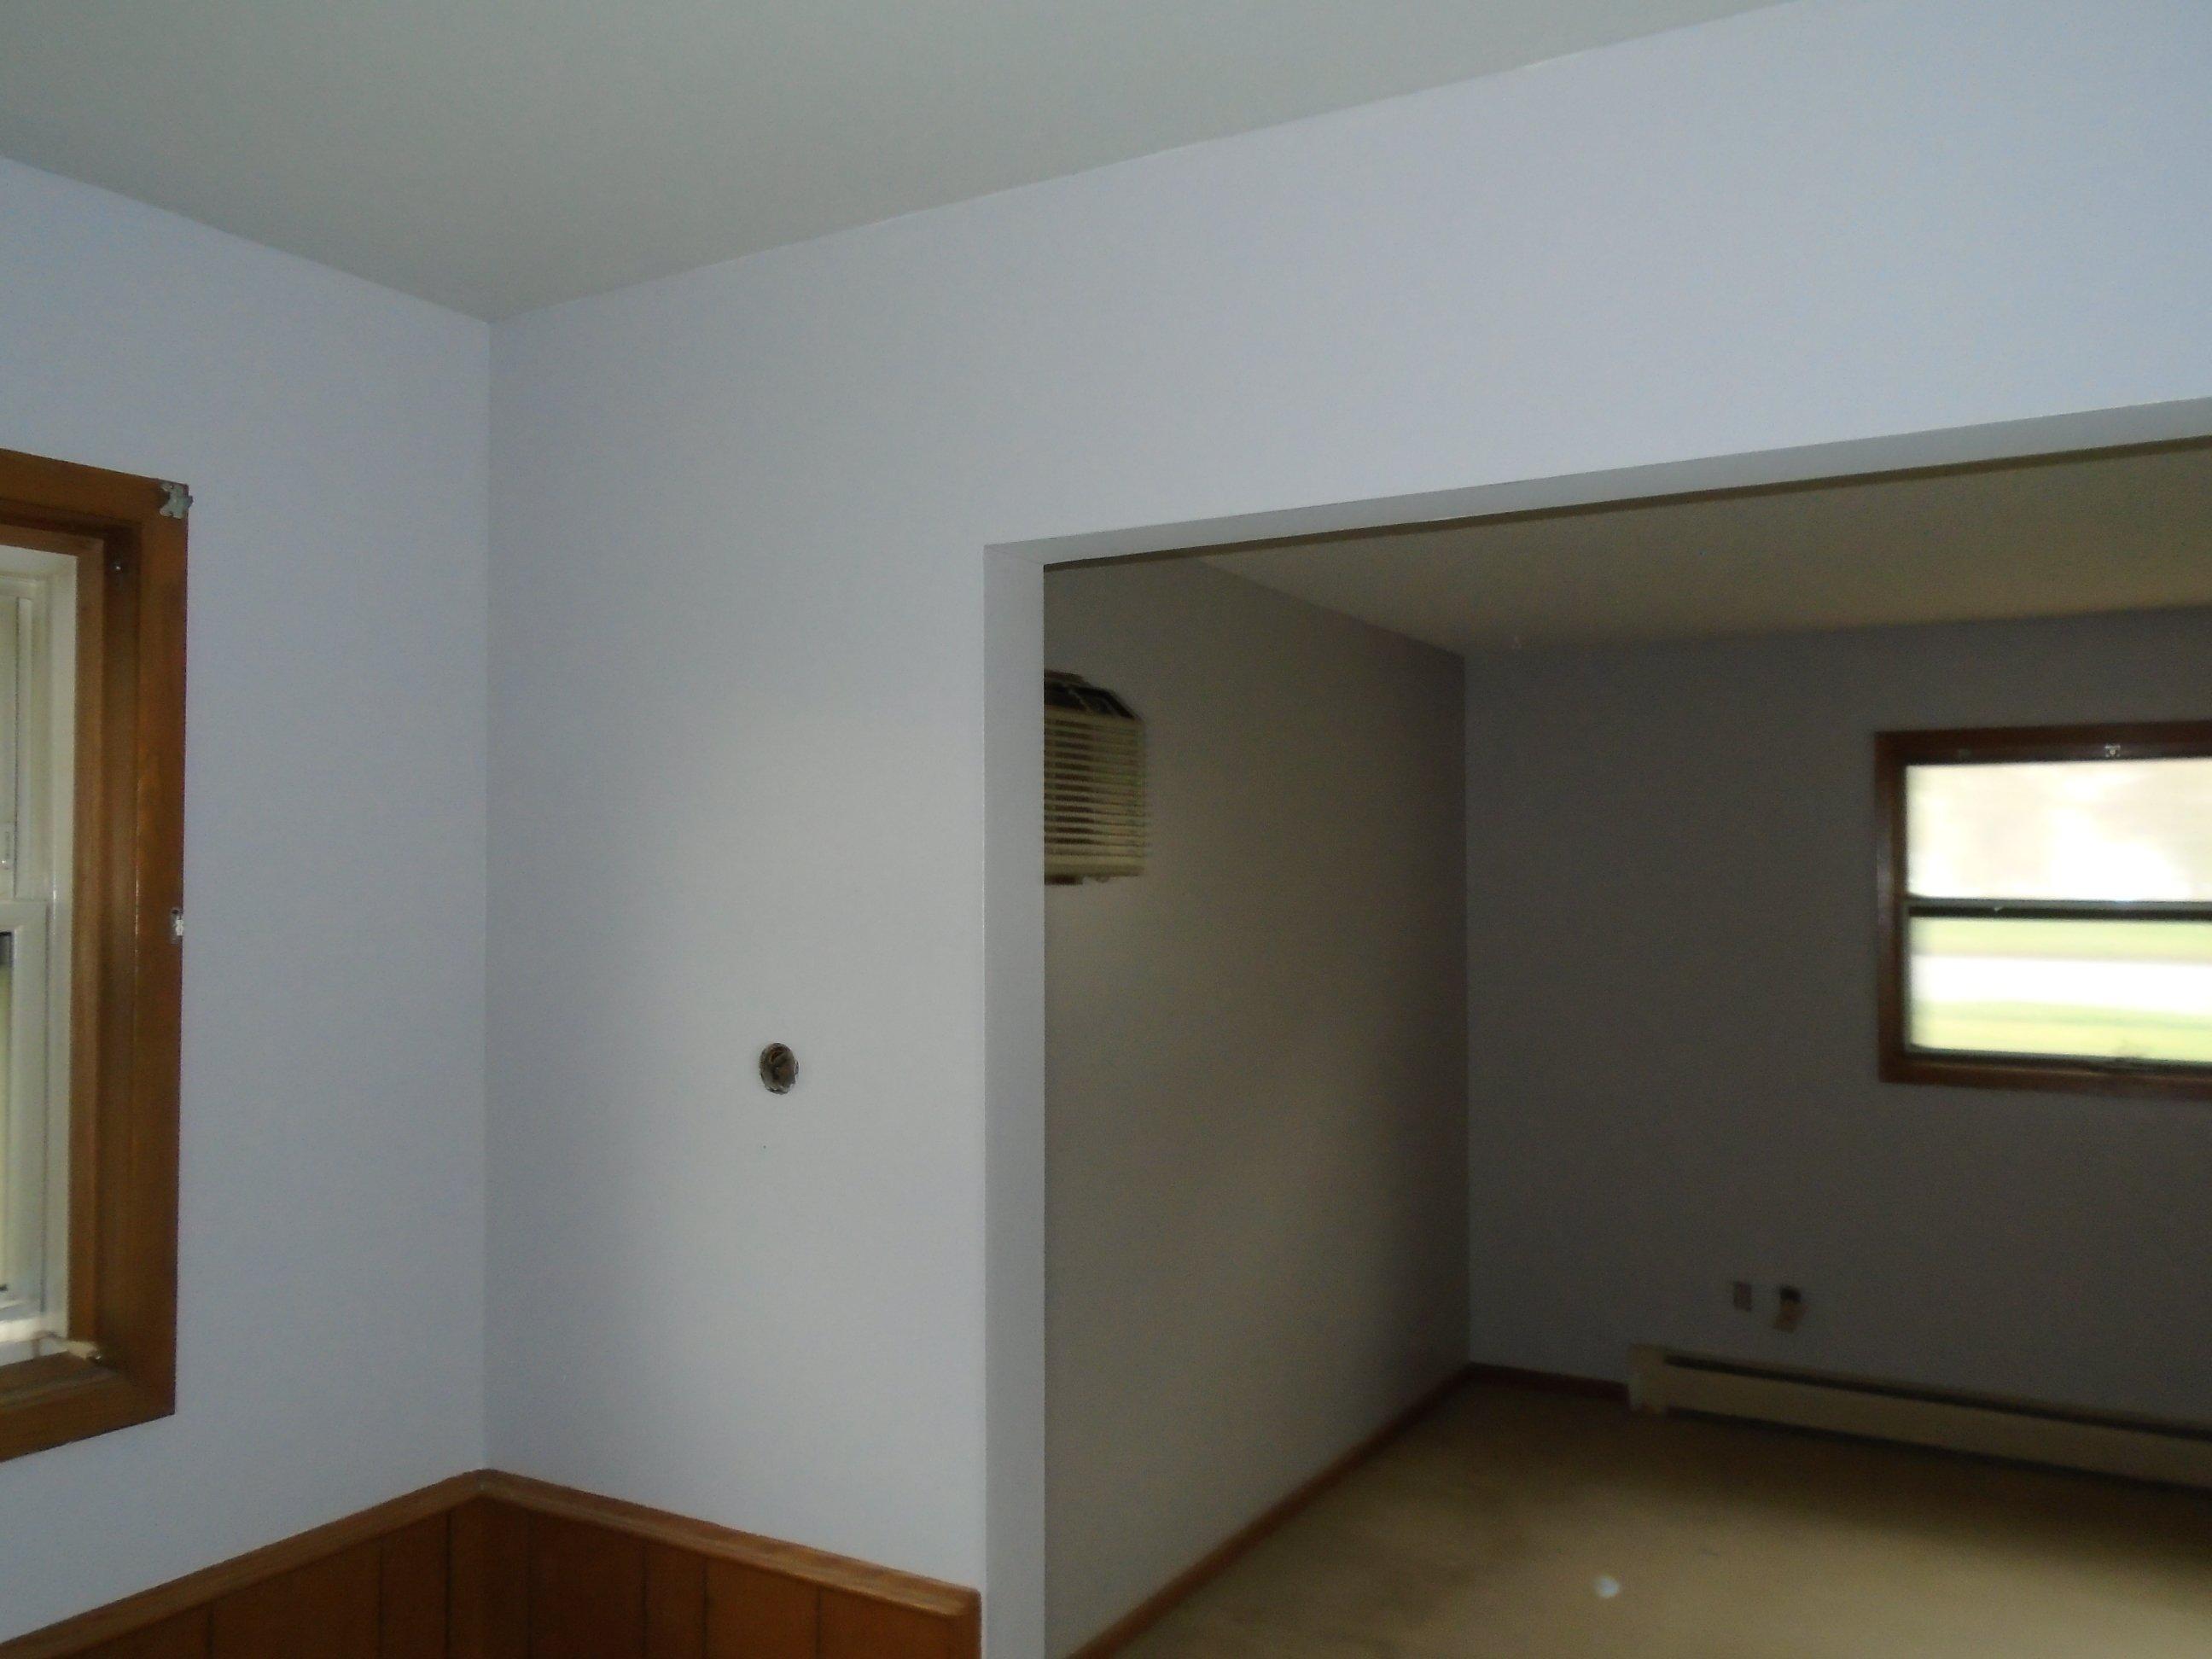 apartment painter